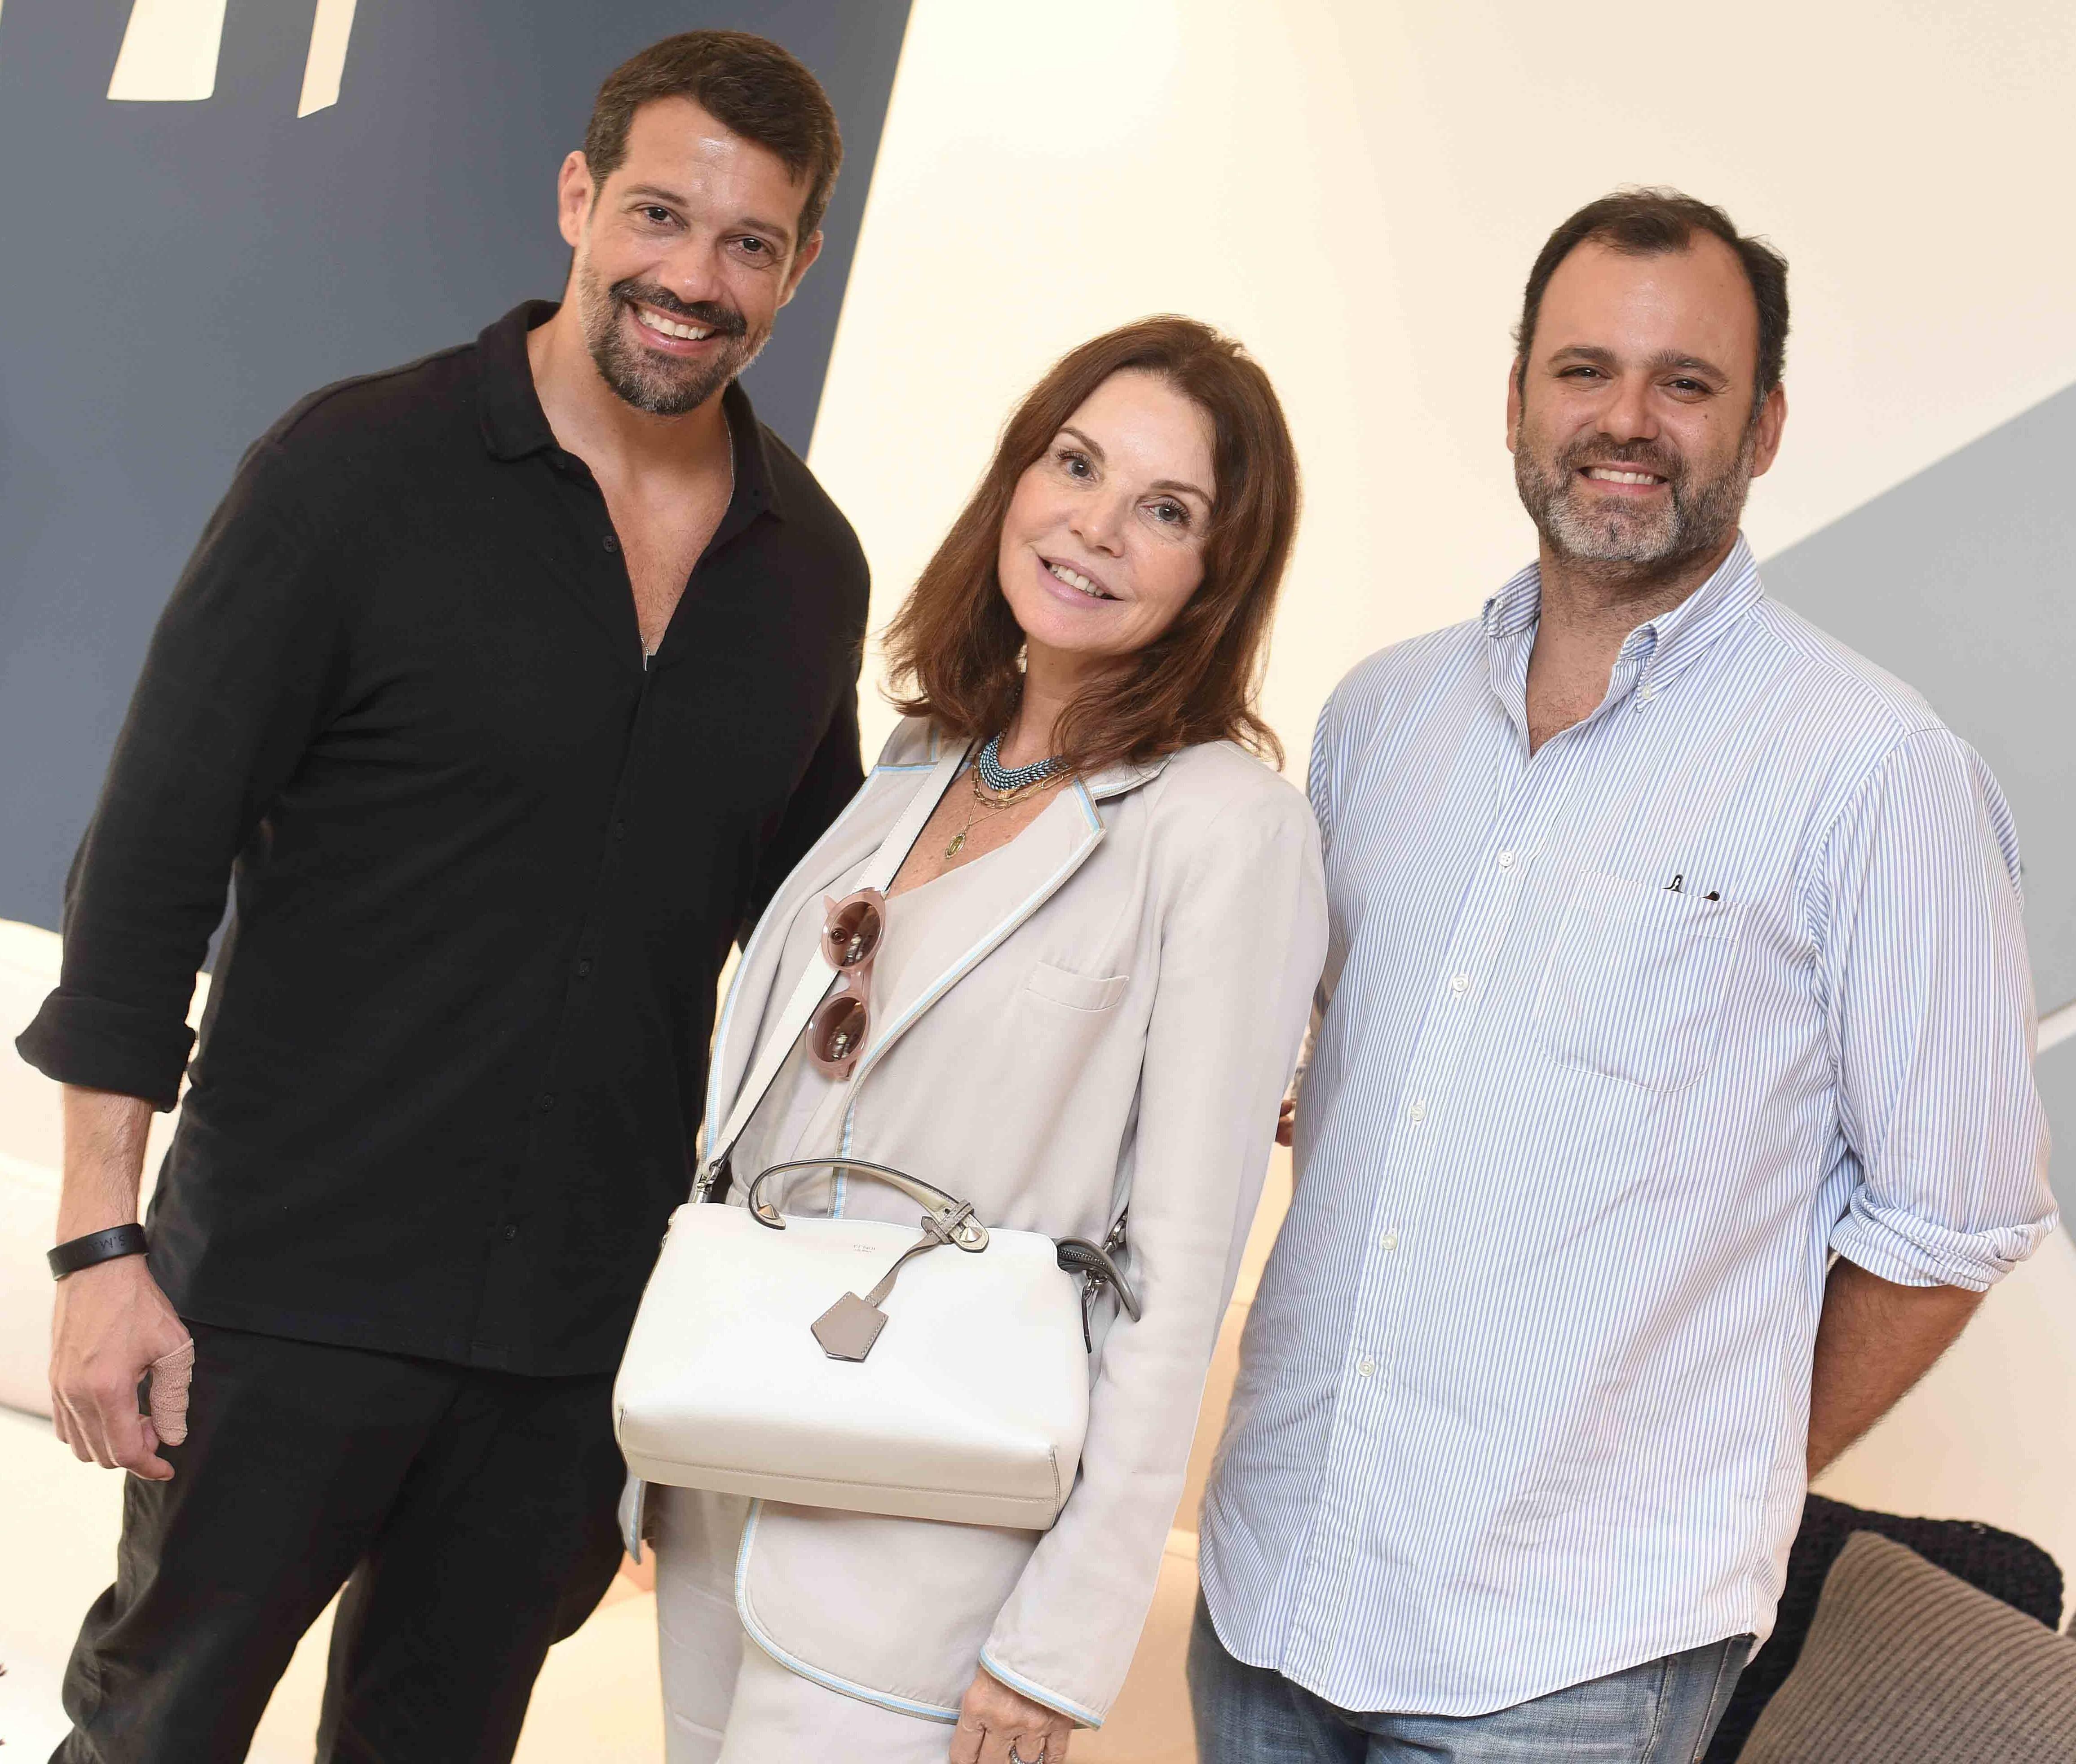 Alexandre Pazzini, Patricia Mayer e Erick Figueira de Mello /Foto: Ari Kaye